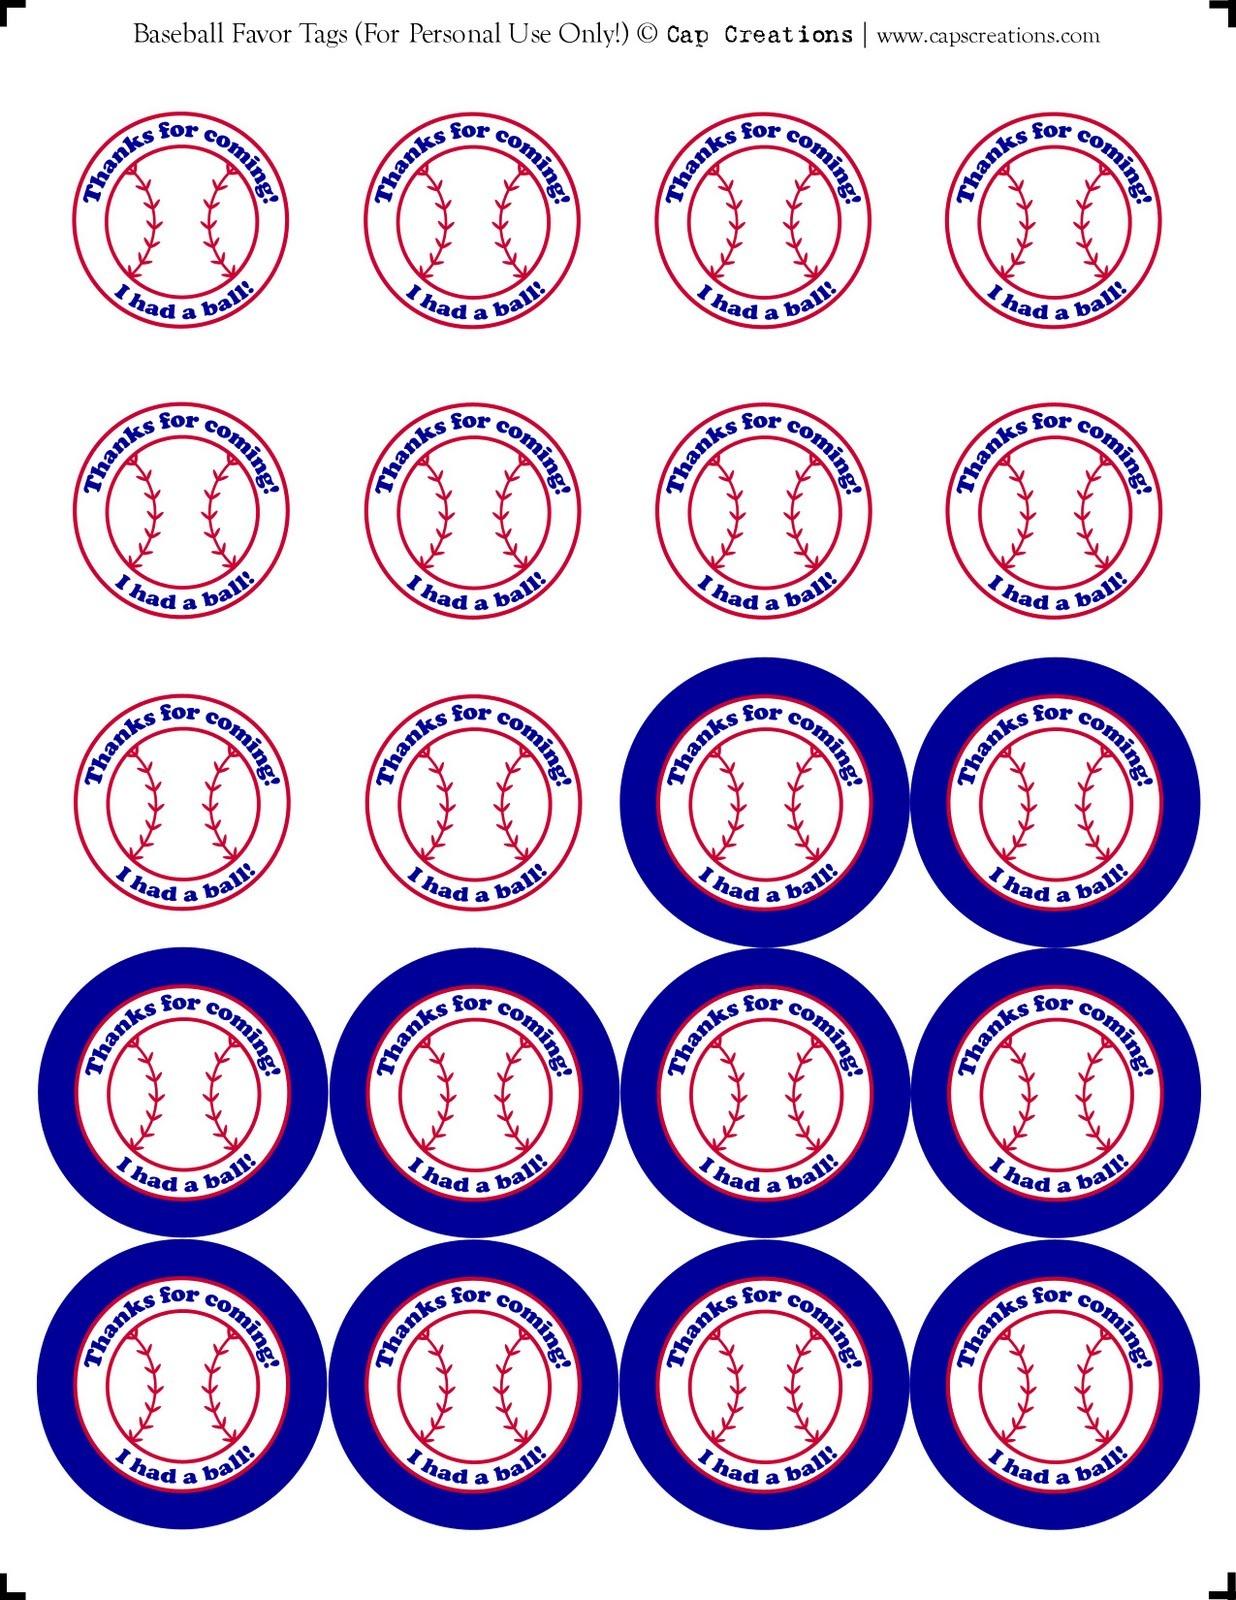 Cap Creations: Printable Baseball Party Favor Thank You Tags - Free Printable Baseball Favor Tags